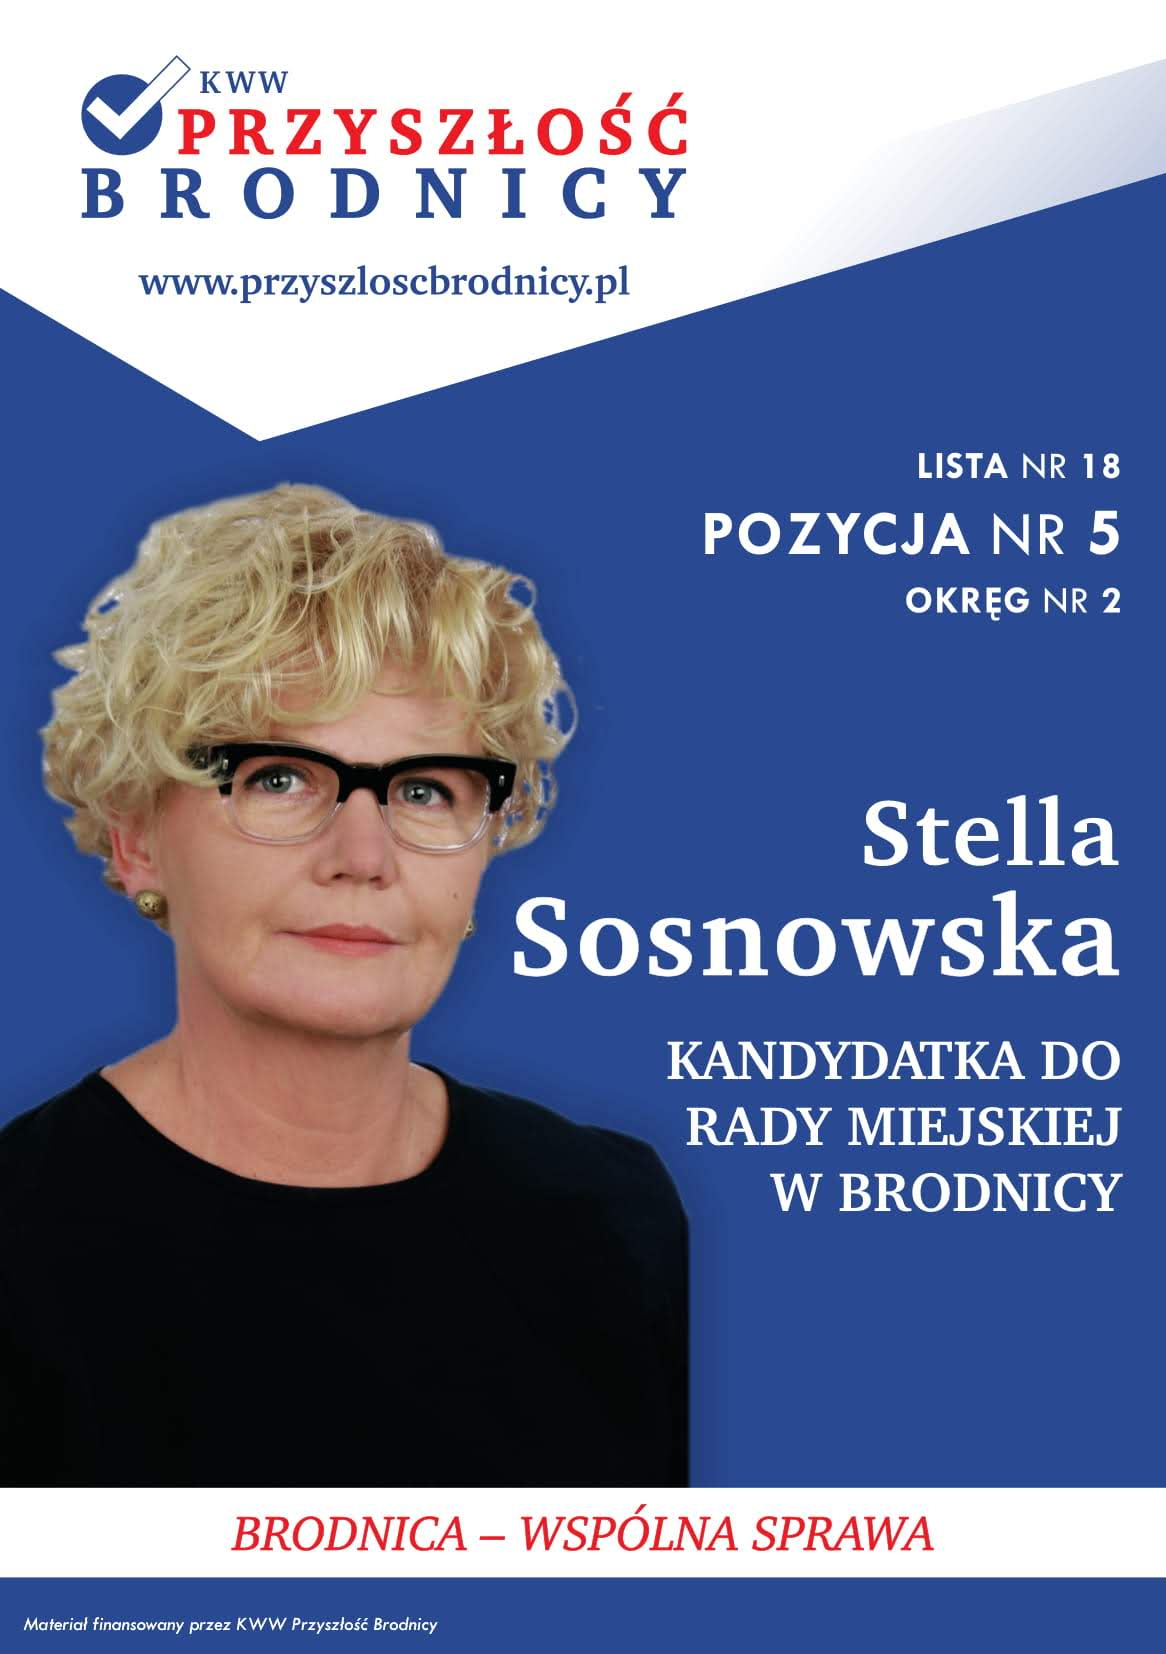 Stella Sosnowska